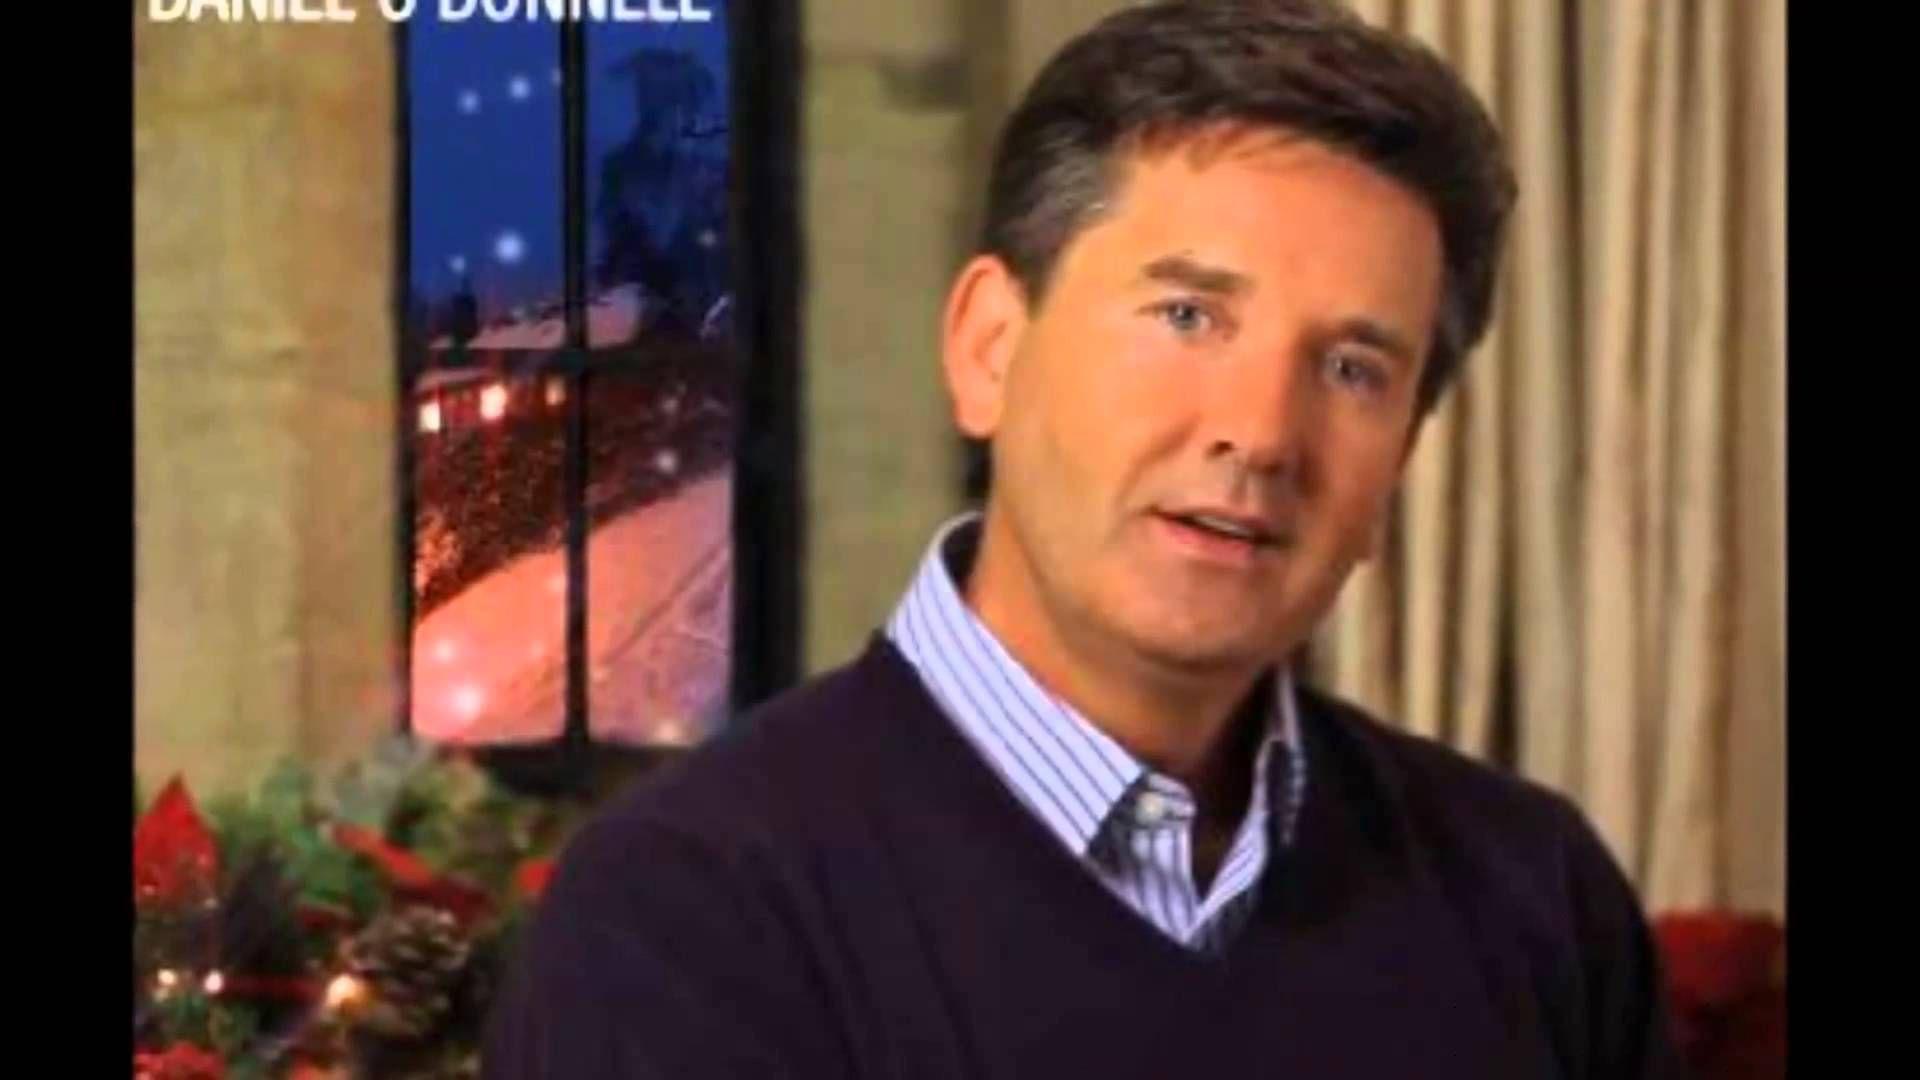 Daniel O'Donnell Silent Night Daniel O'Donnell YouTube